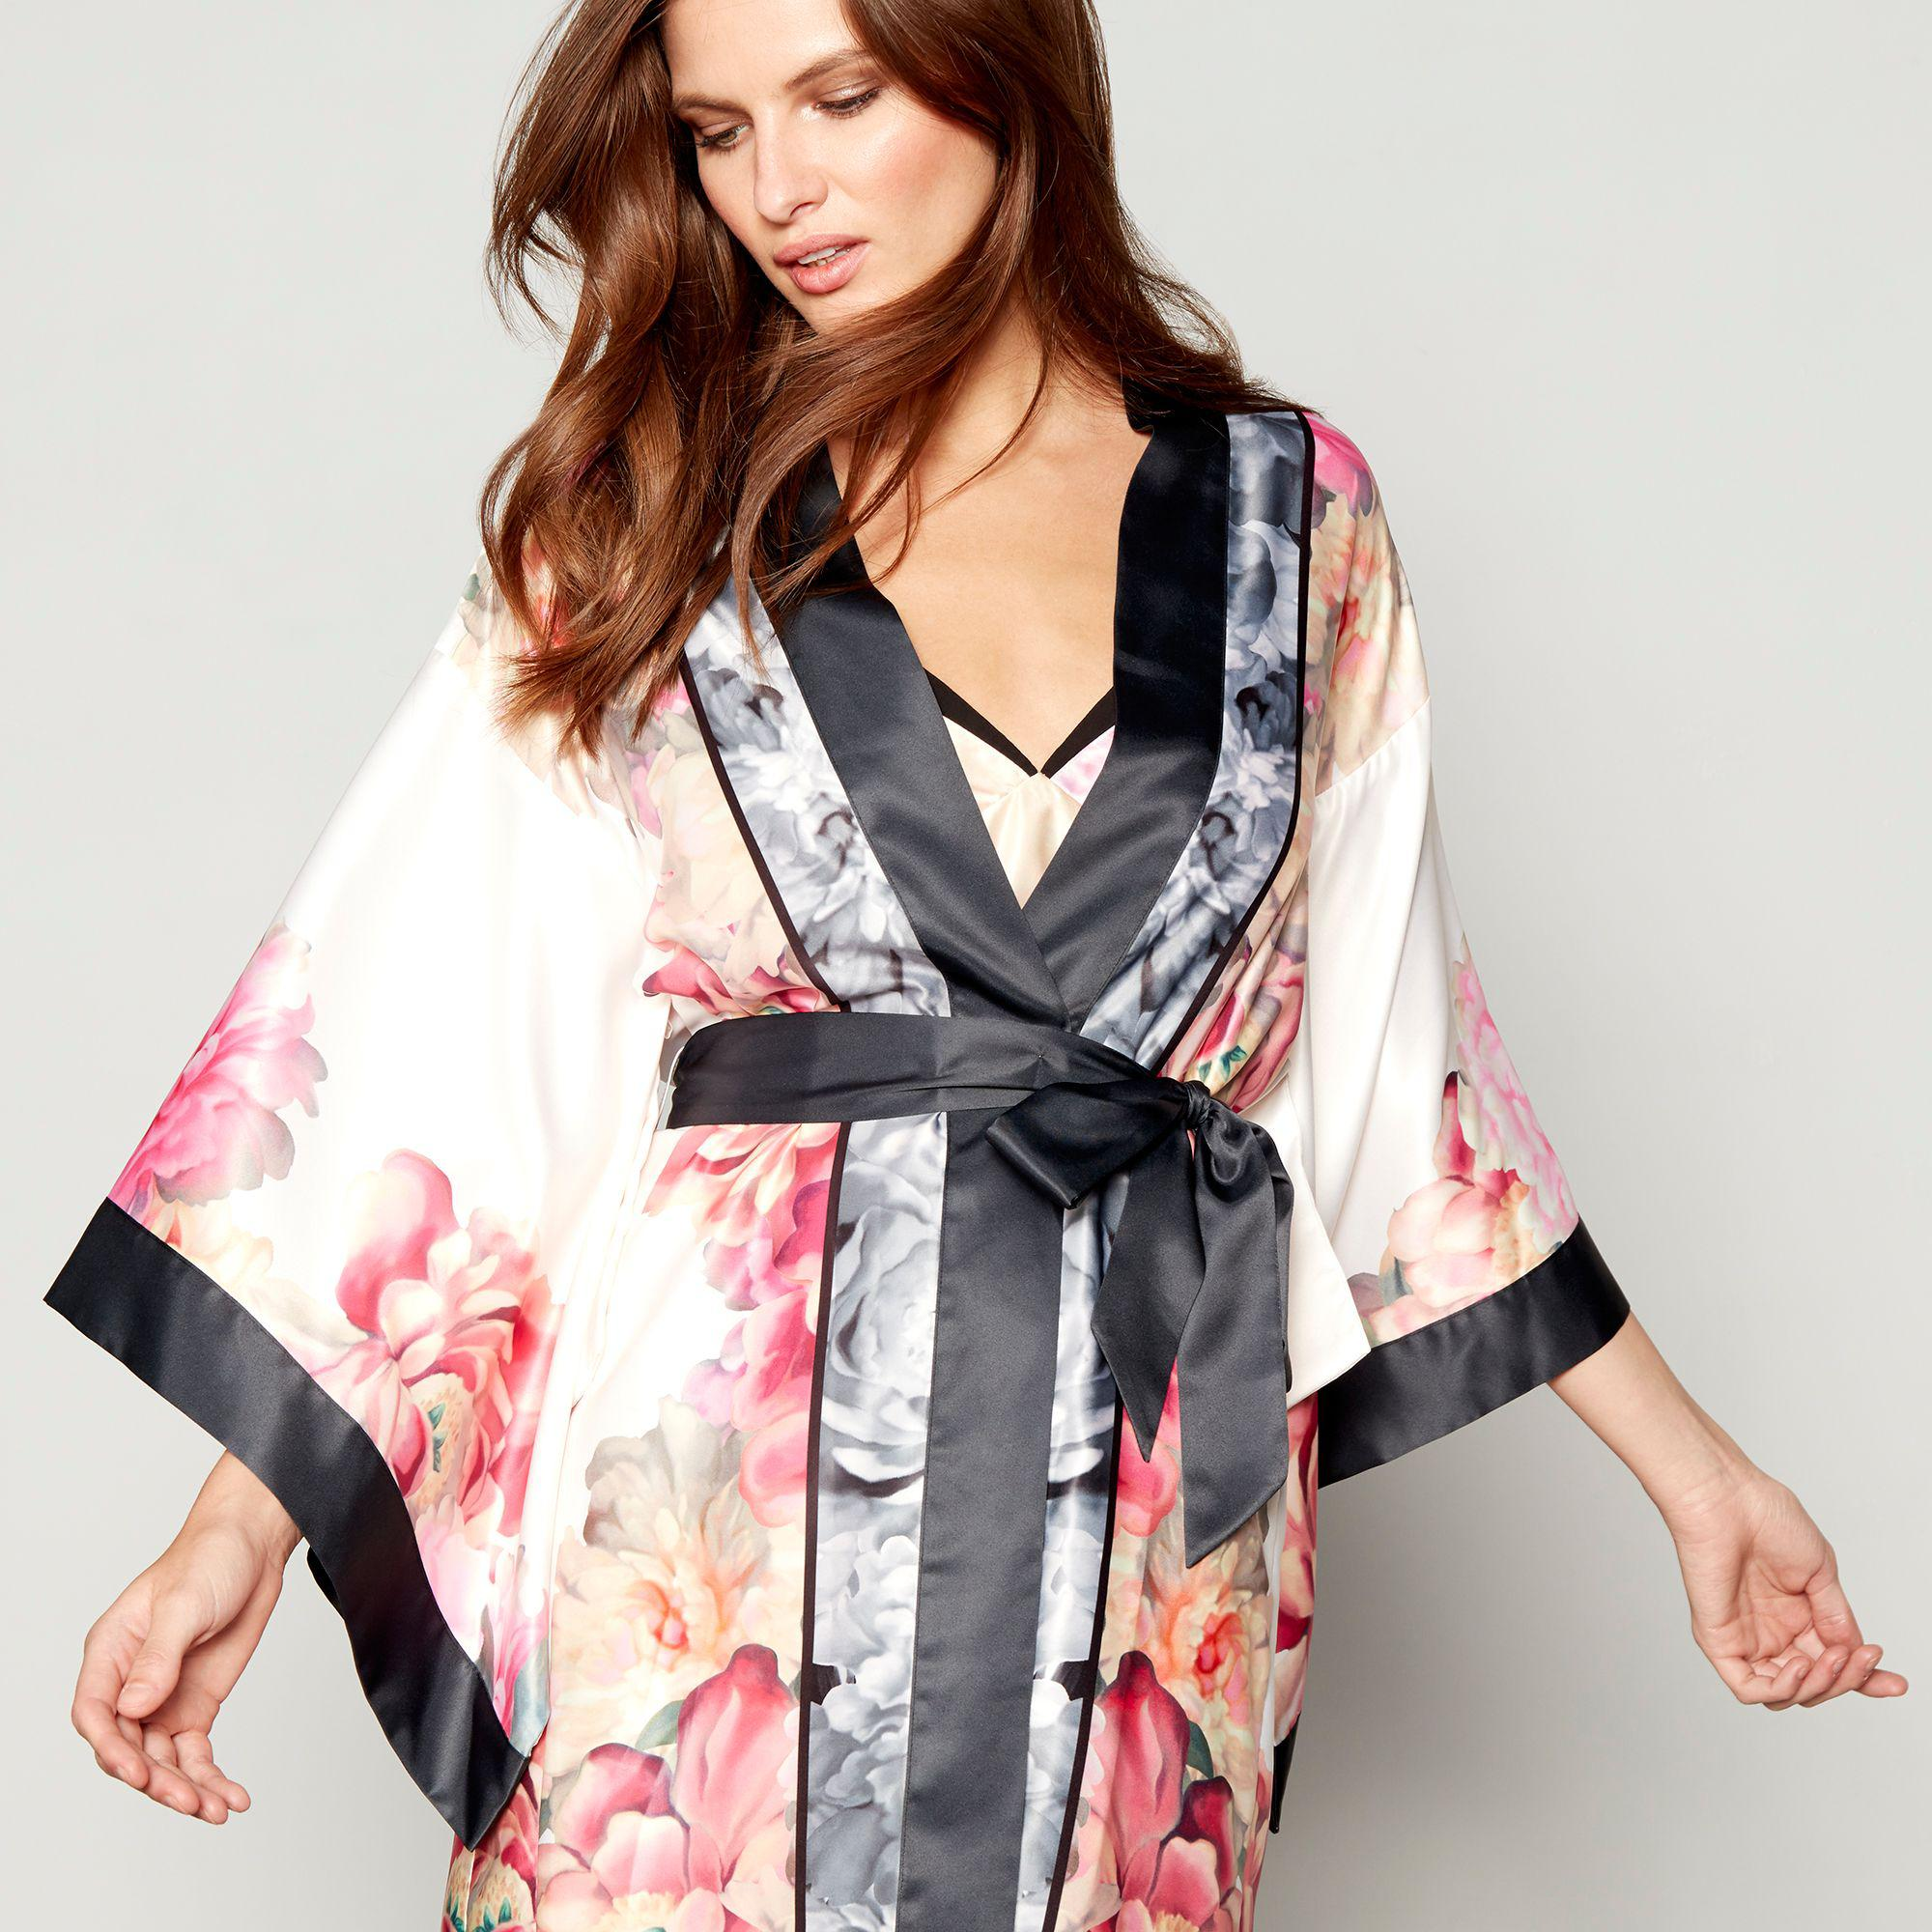 7694b6fb4e9 Ted Baker Light Pink Floral Print Satin 'painted Posey' Kimono ...